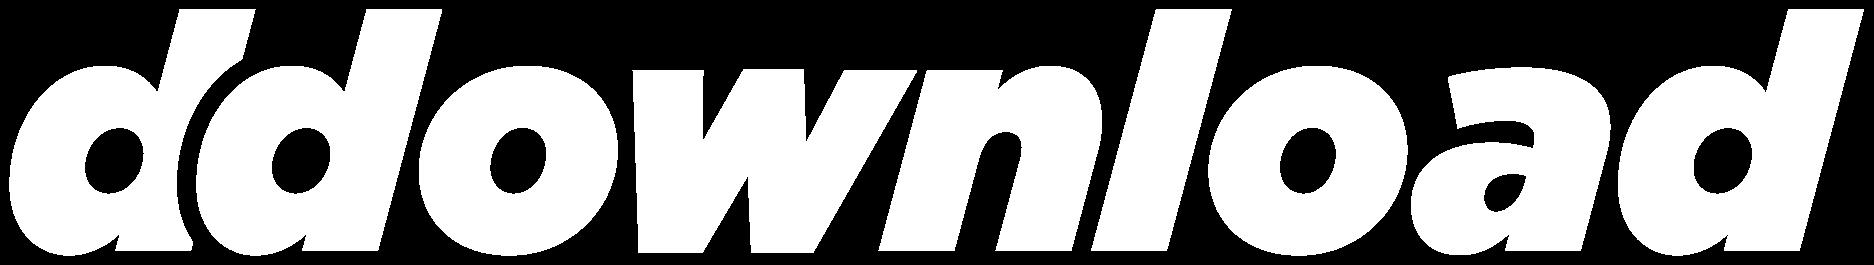 DDownload.com logo